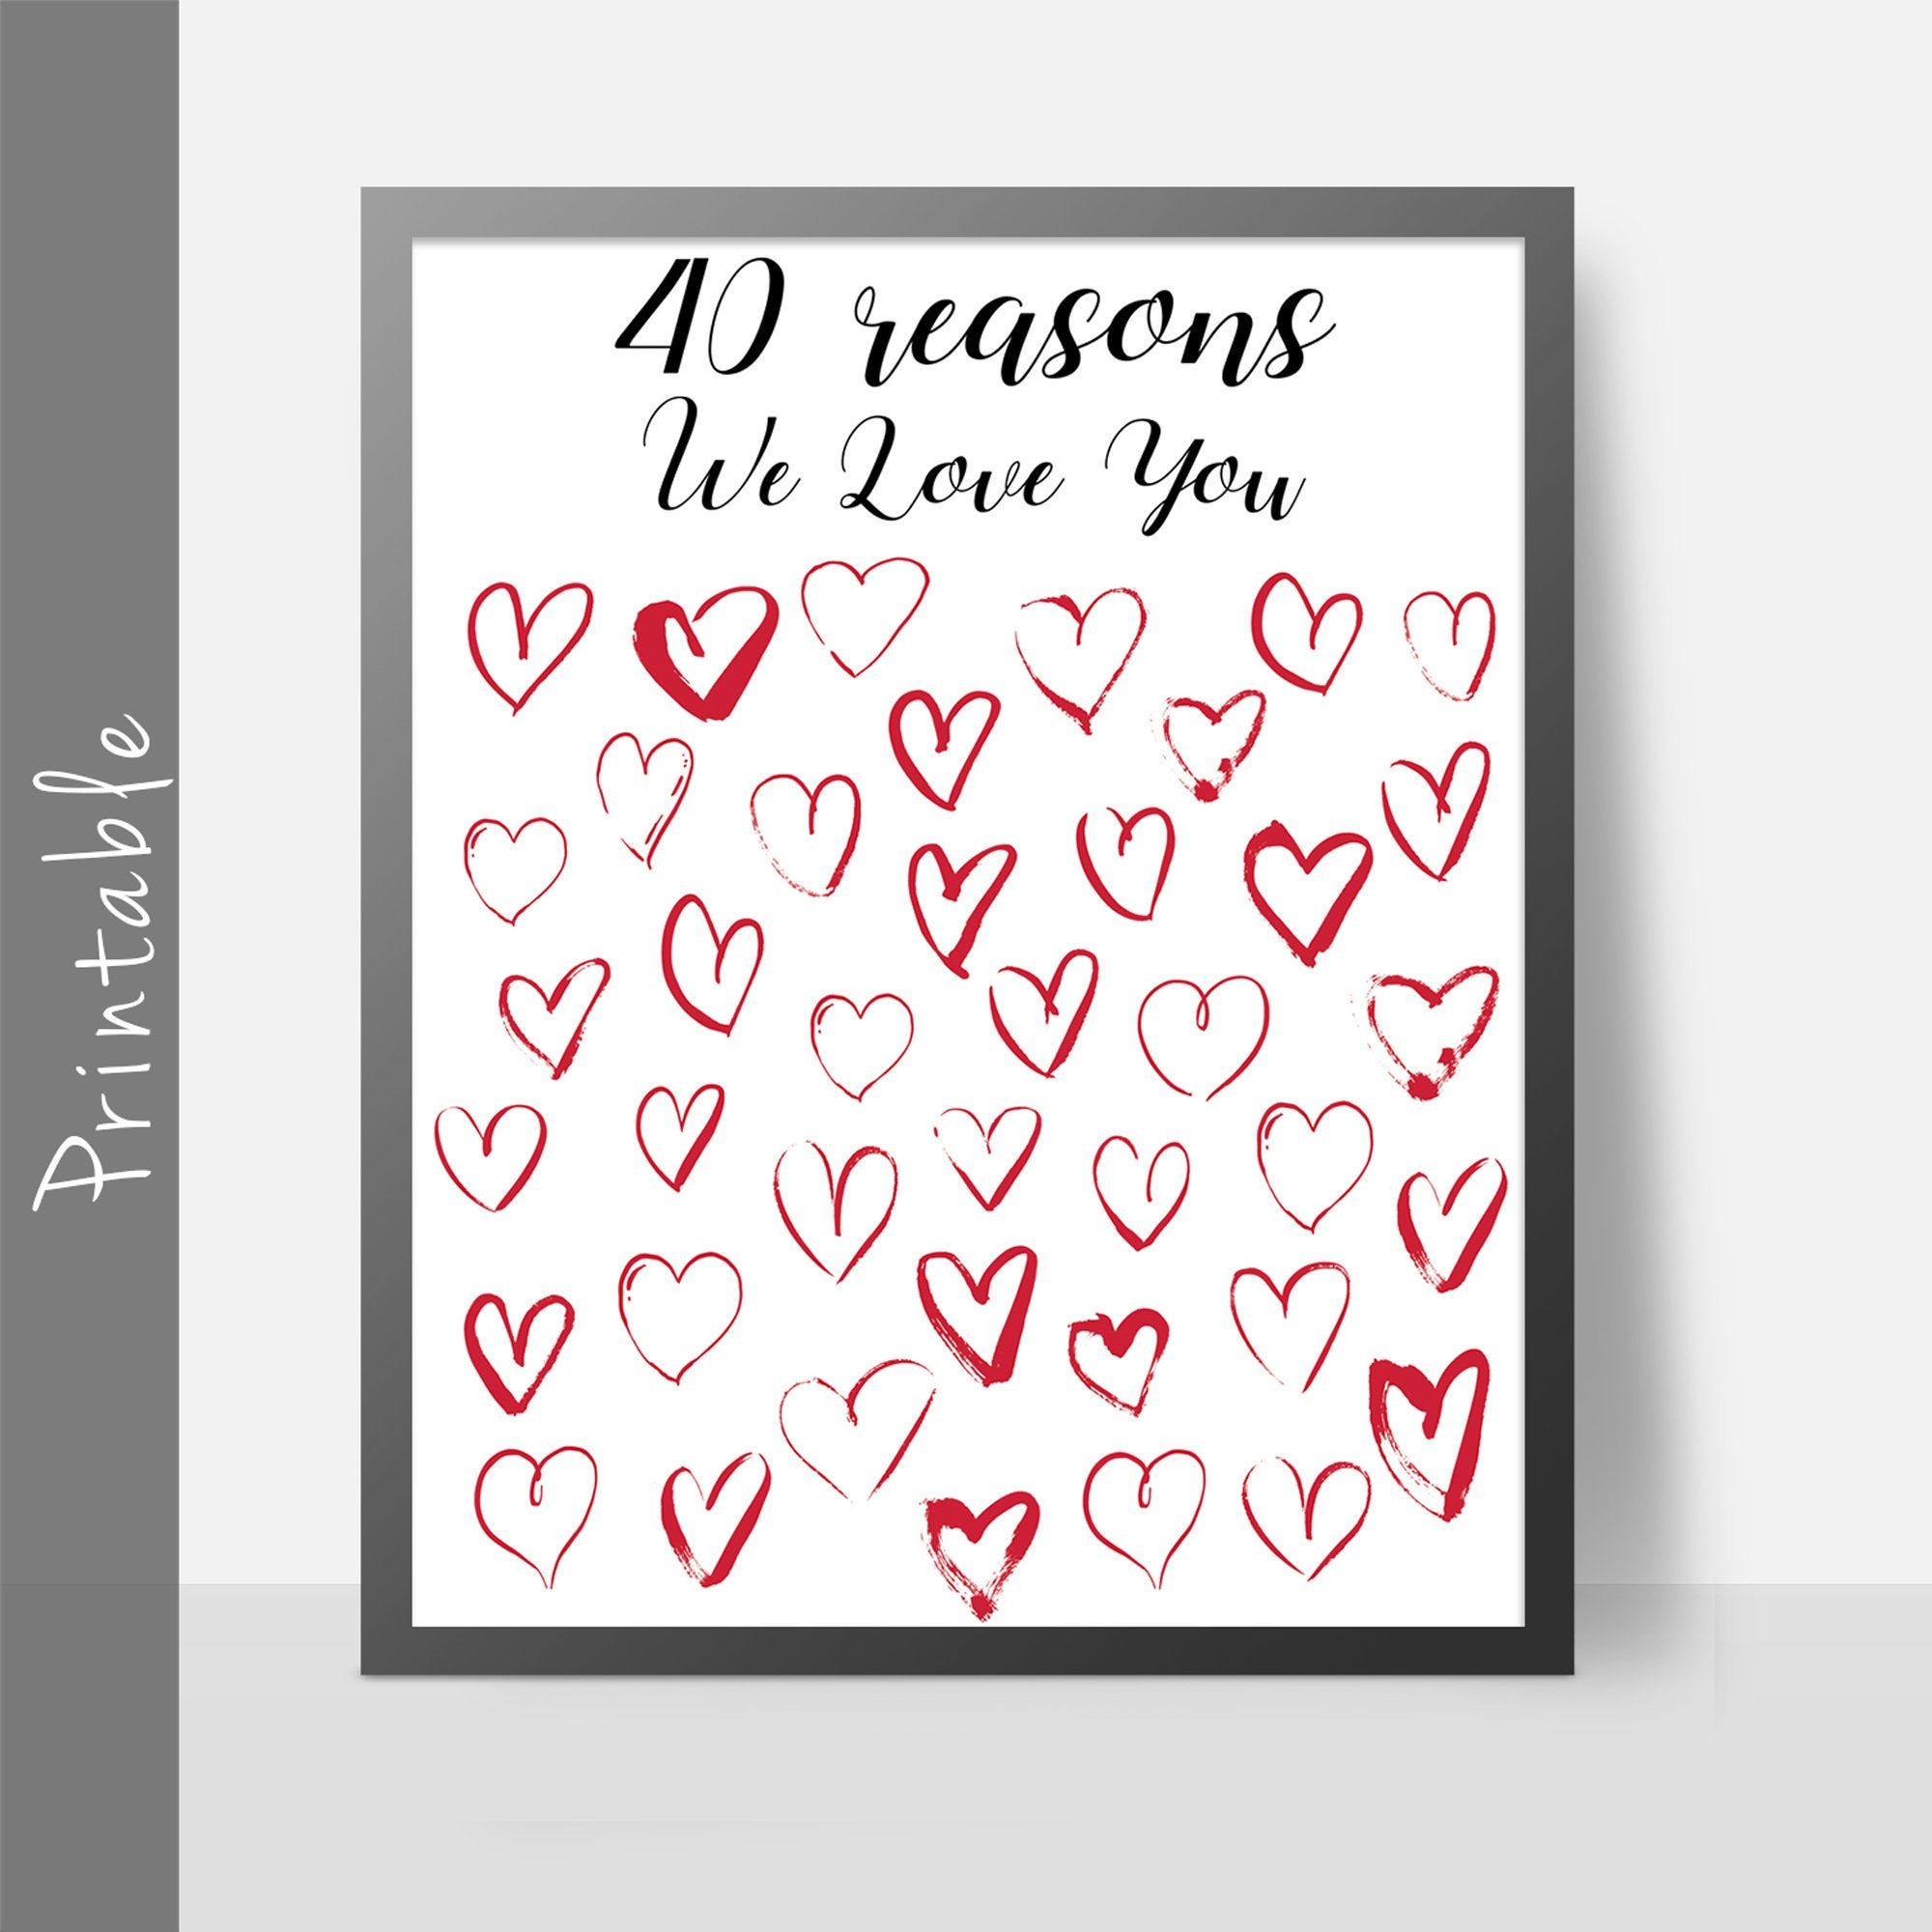 40 Reasons We Love You Printable Gift Etsy Printable Gift 40th Birthday Gifts 40th Birthday Gifts For Women